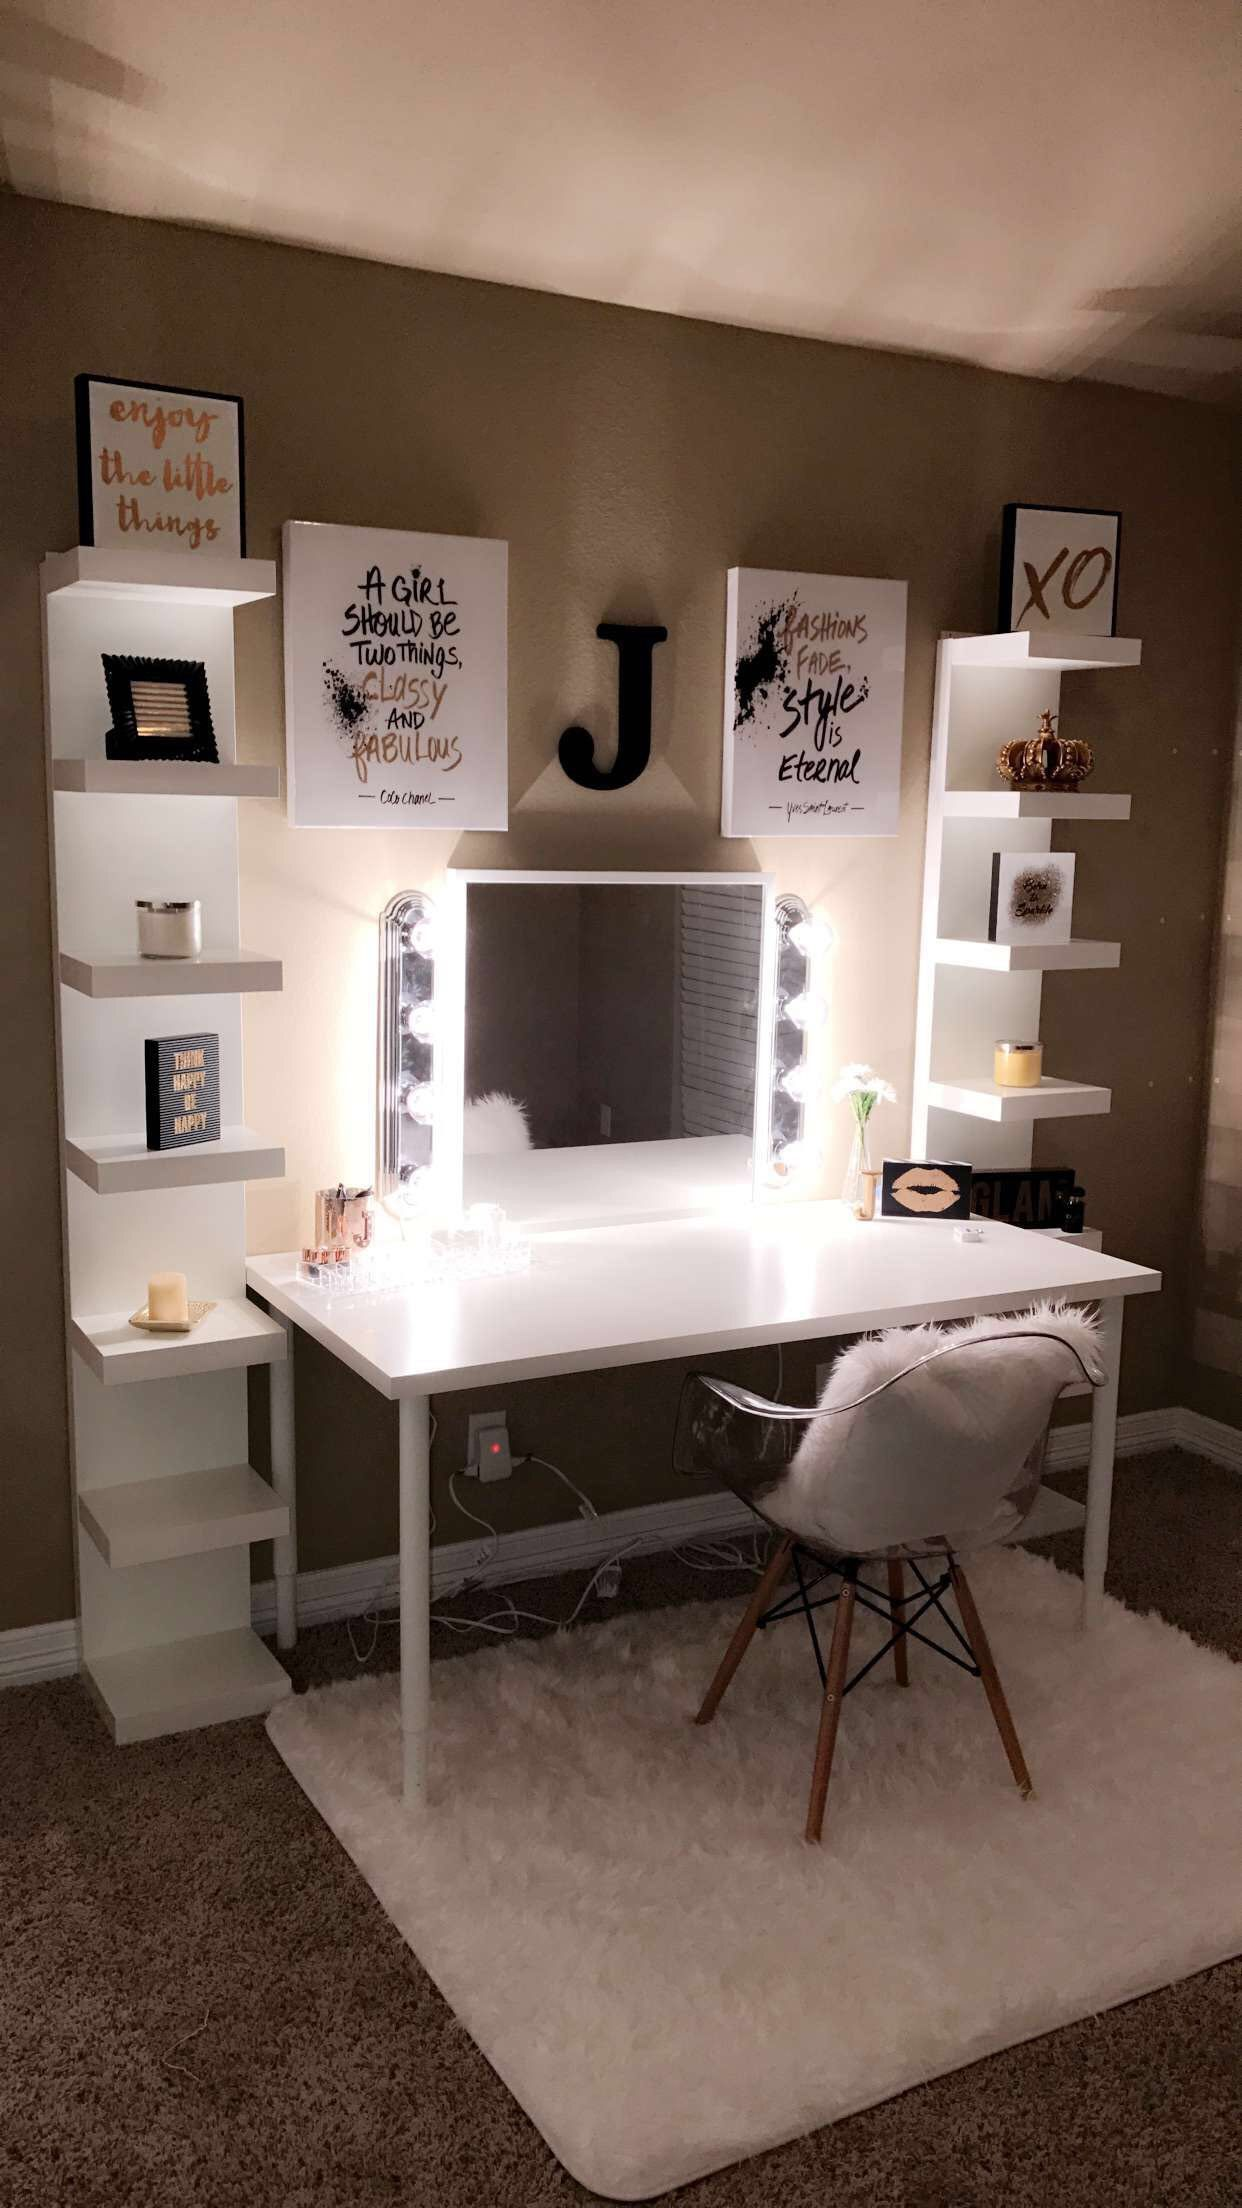 Beautiful vanity with diy lights ashley jensen house ideas also best images in decoracion del hogar diseno rh ar pinterest